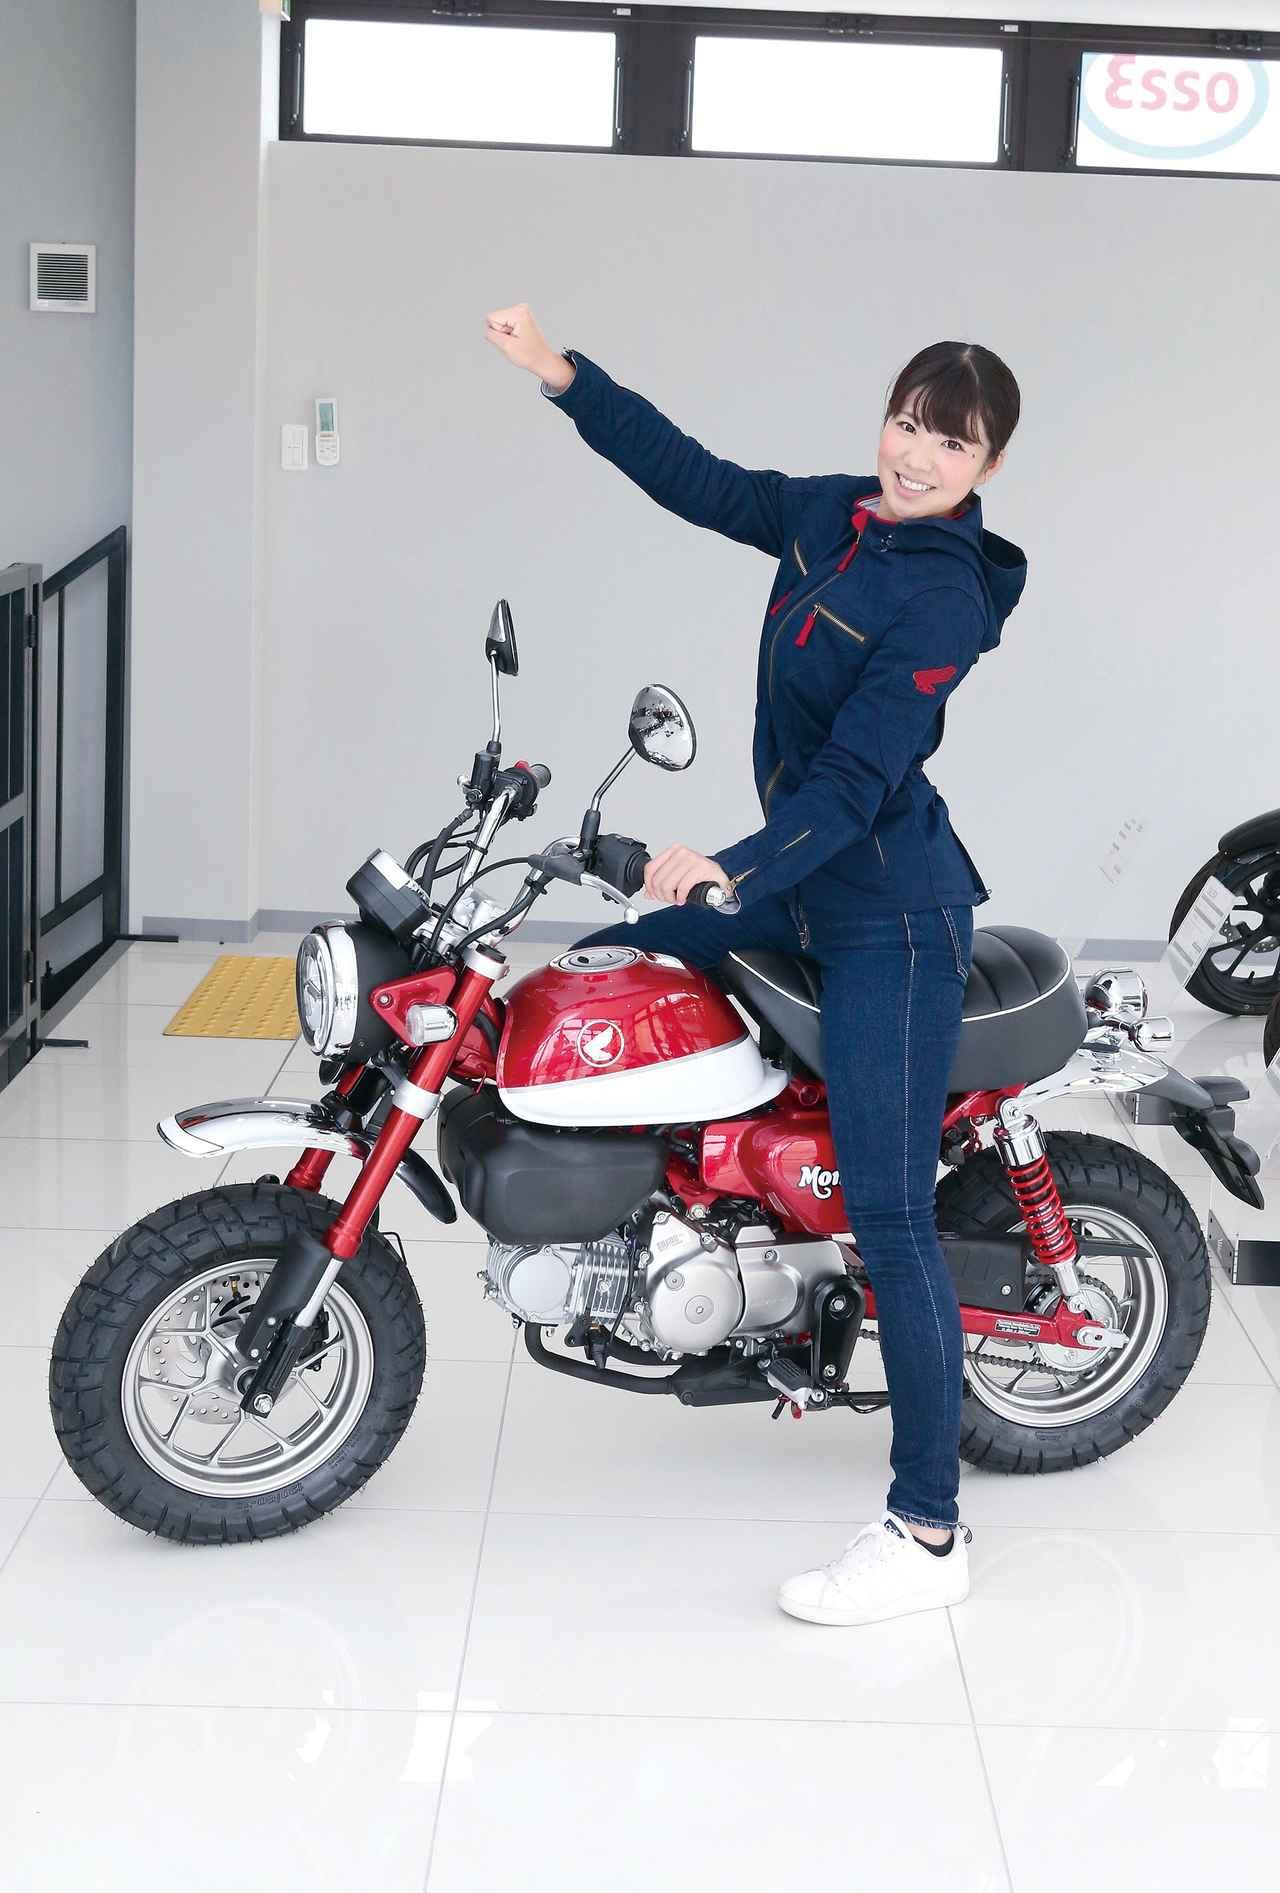 Images : 4番目の画像 - Honda Dream 神戸三田 - webオートバイ